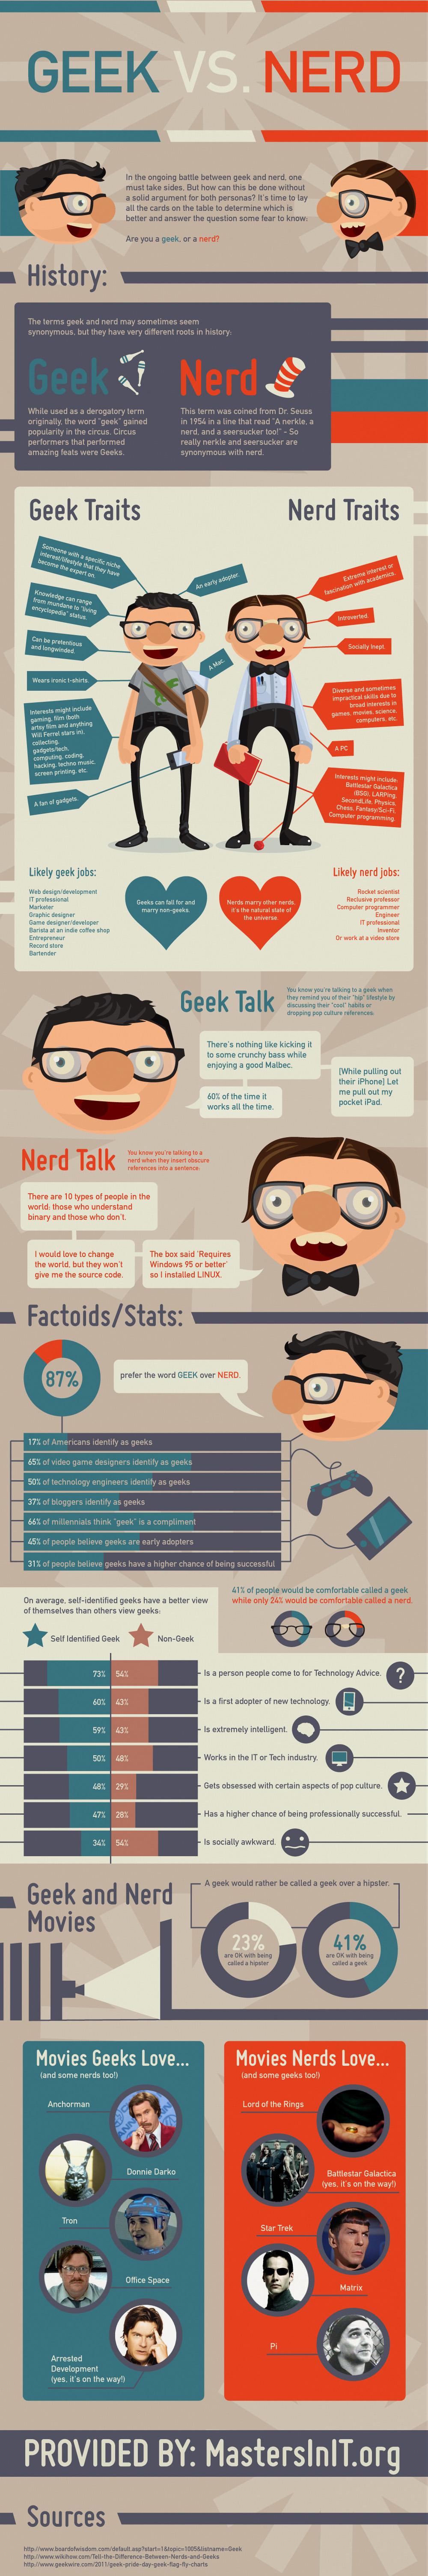 Infographic: Geeks vs Nerds